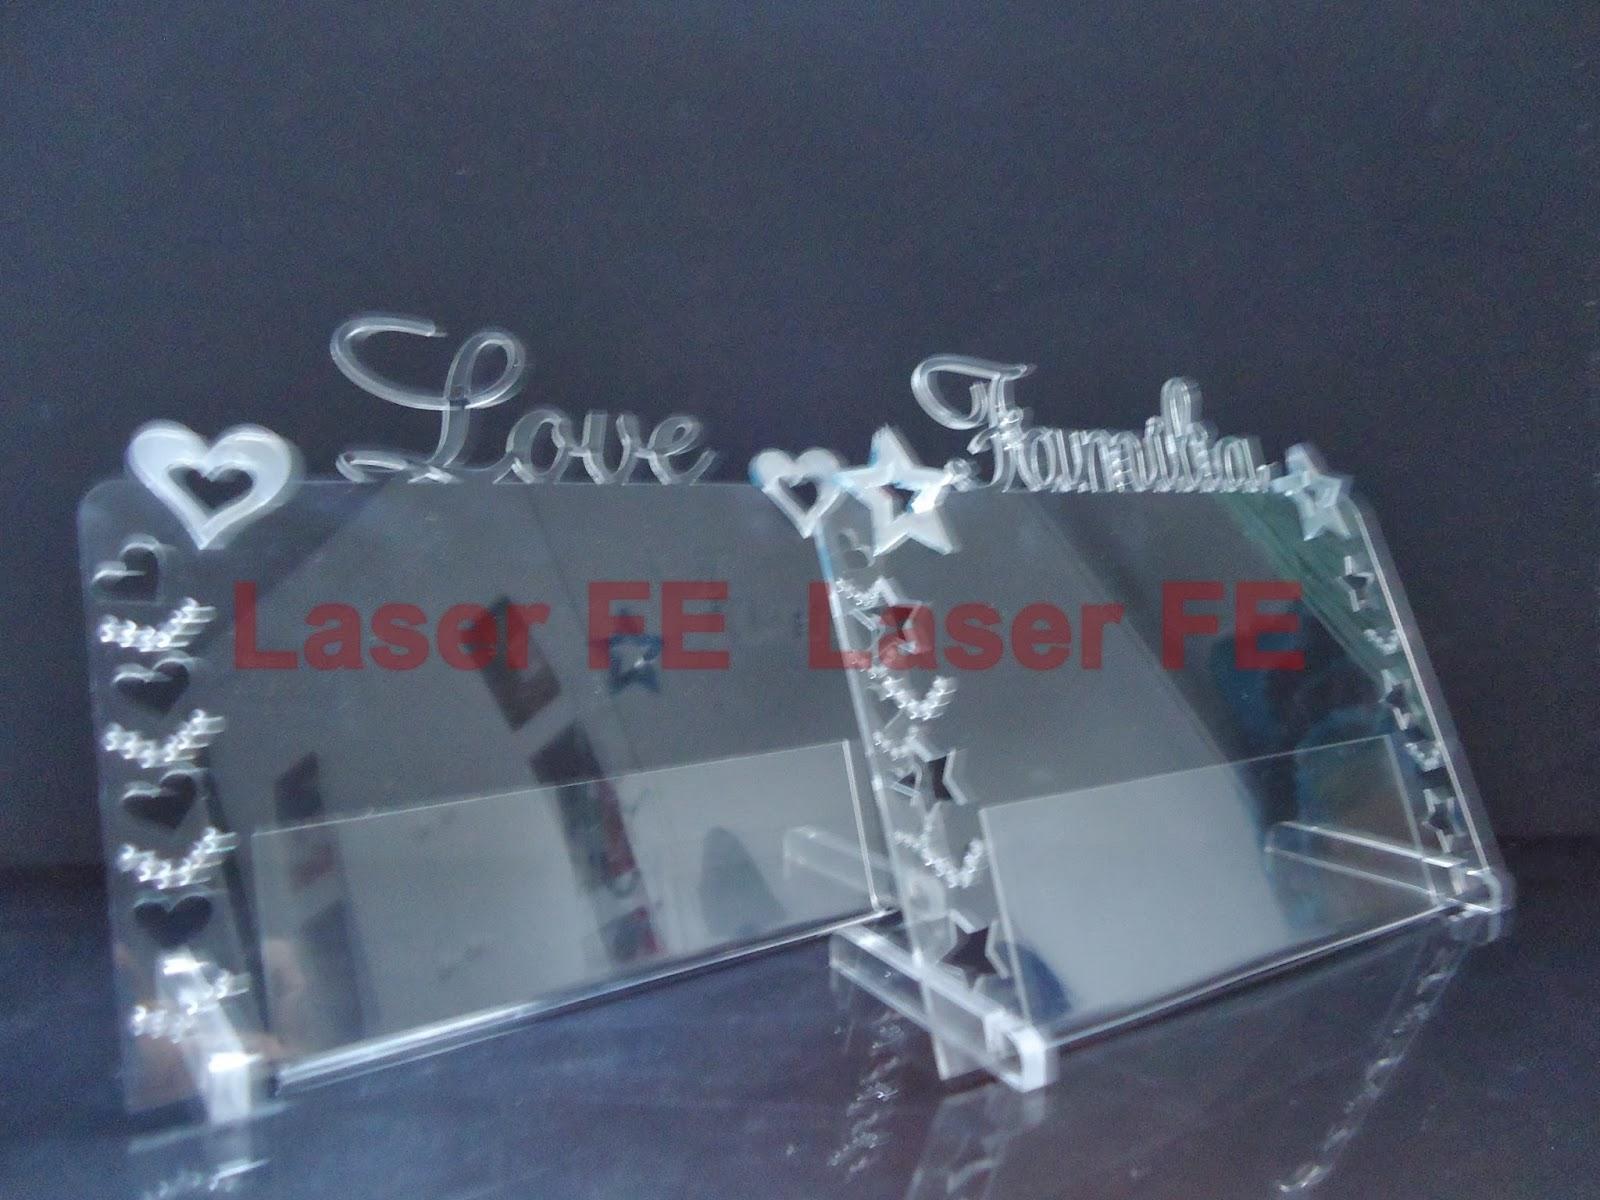 LaserFE: Corte a Laser porta retrato em acrílico! #446887 1600x1200